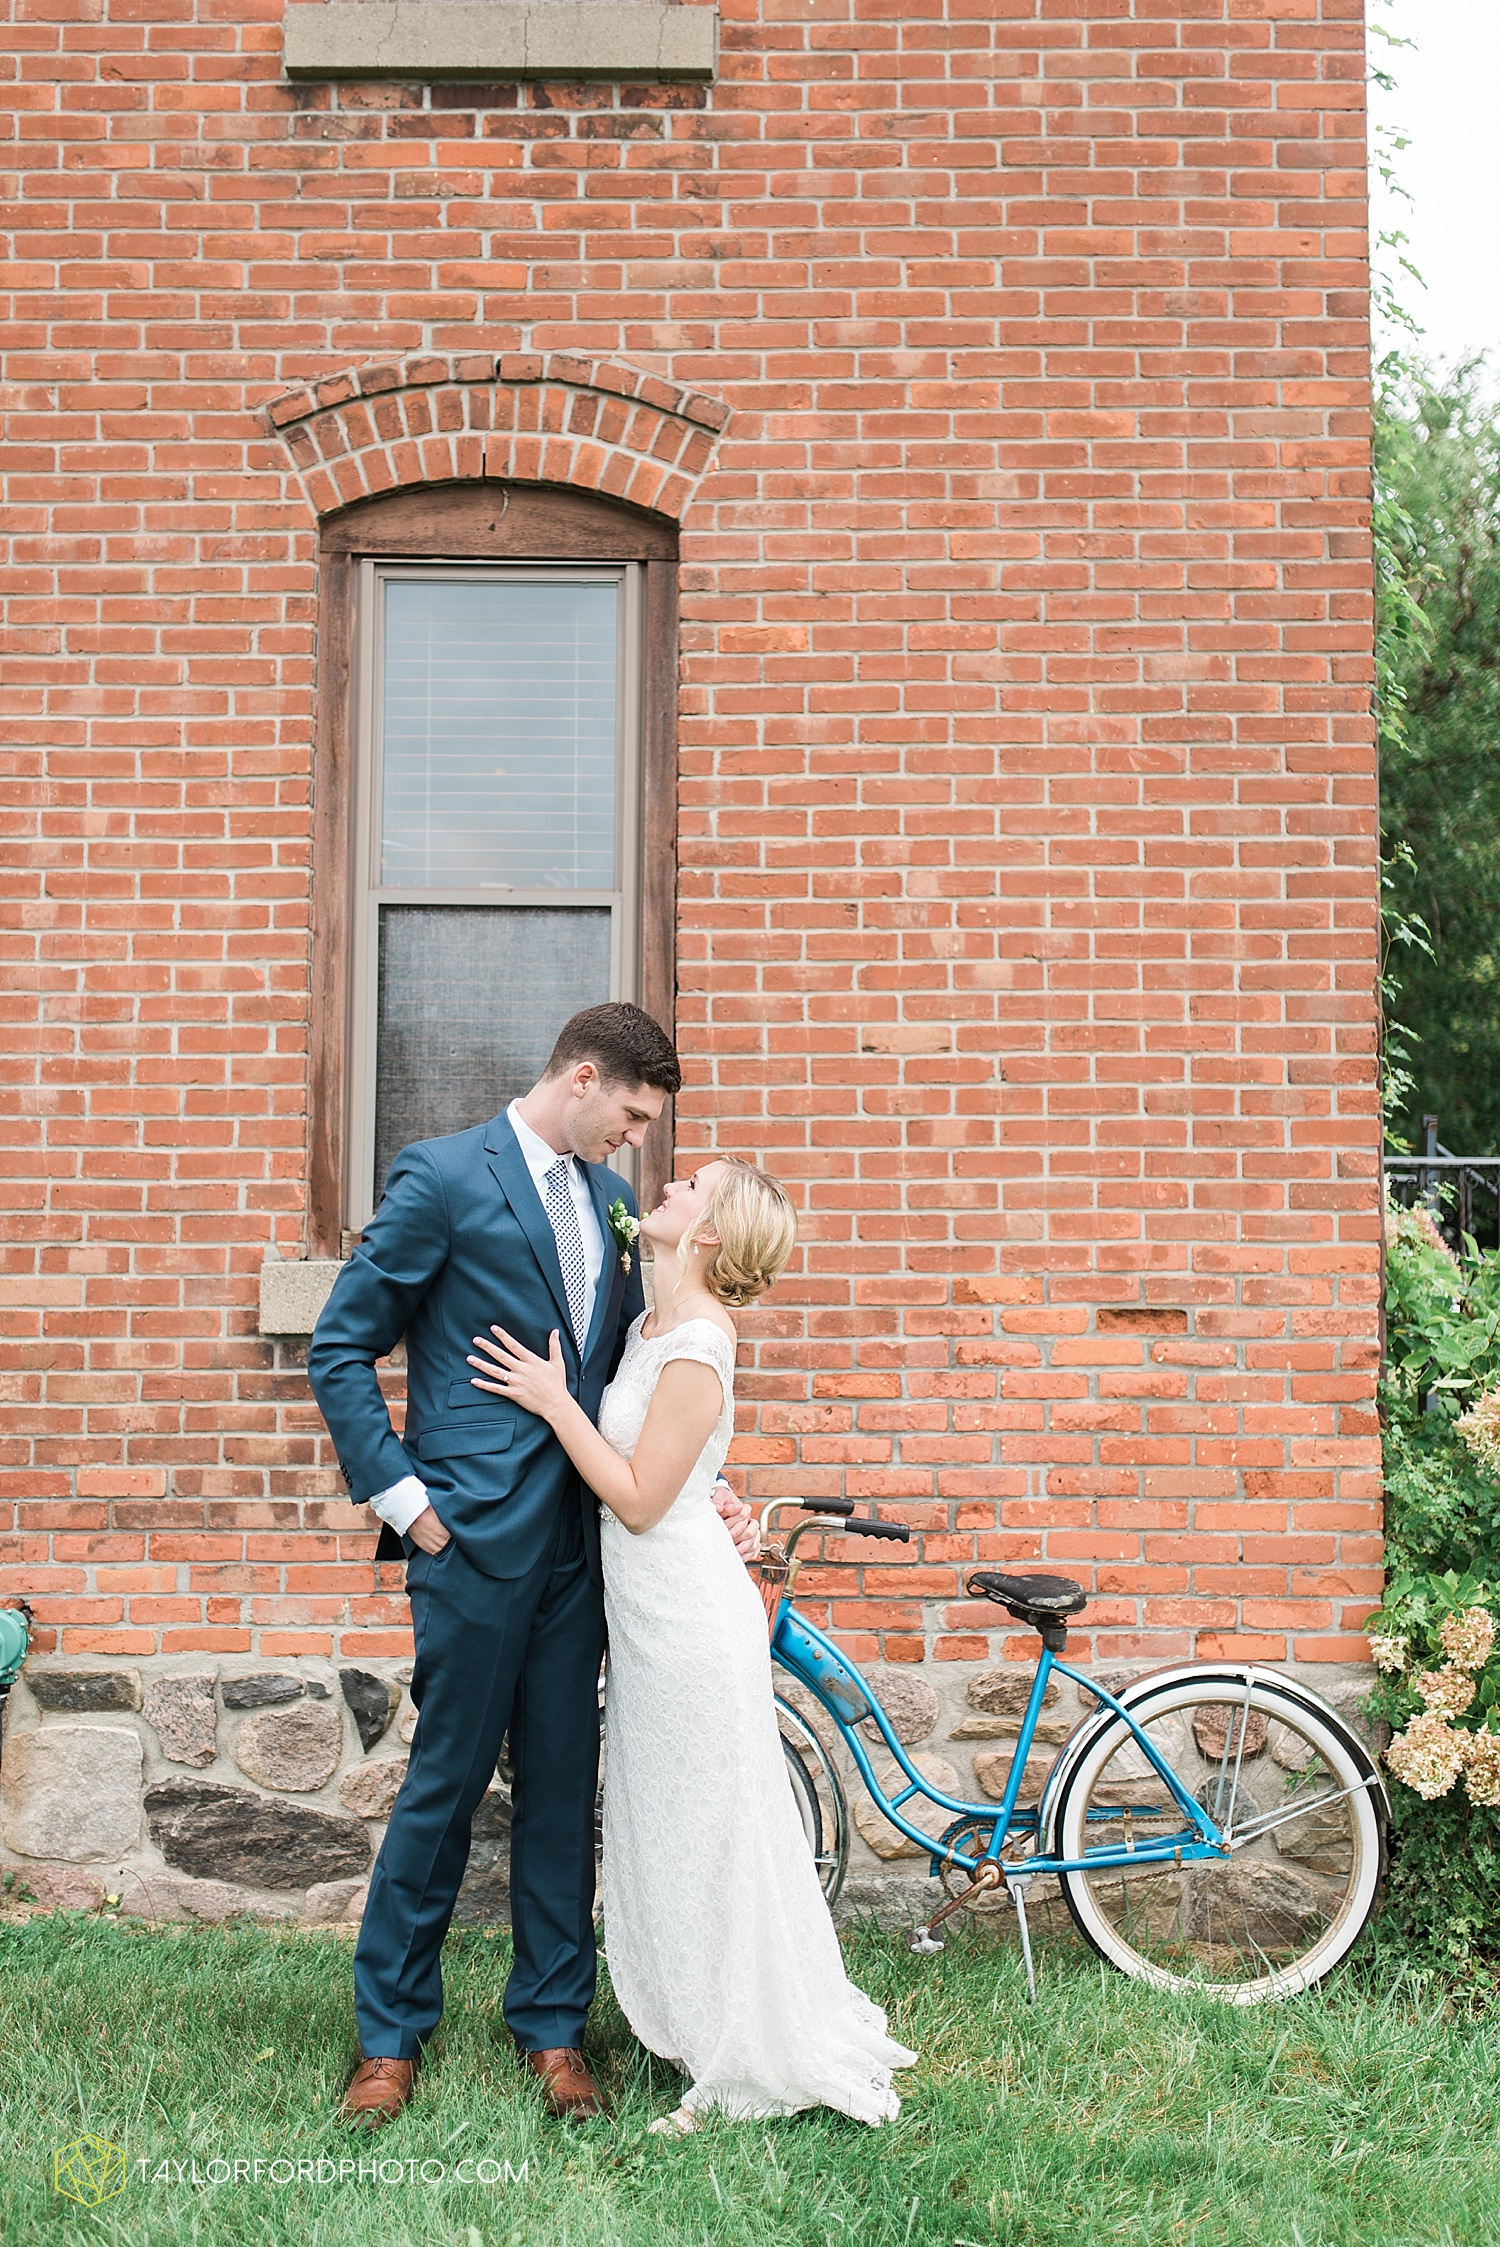 fort_wayne_indiana_van_wert_columbus_ohio_nashville_tennessee_photographer_taylor_ford_shoppes_at_old_mill_wedding_0655.jpg